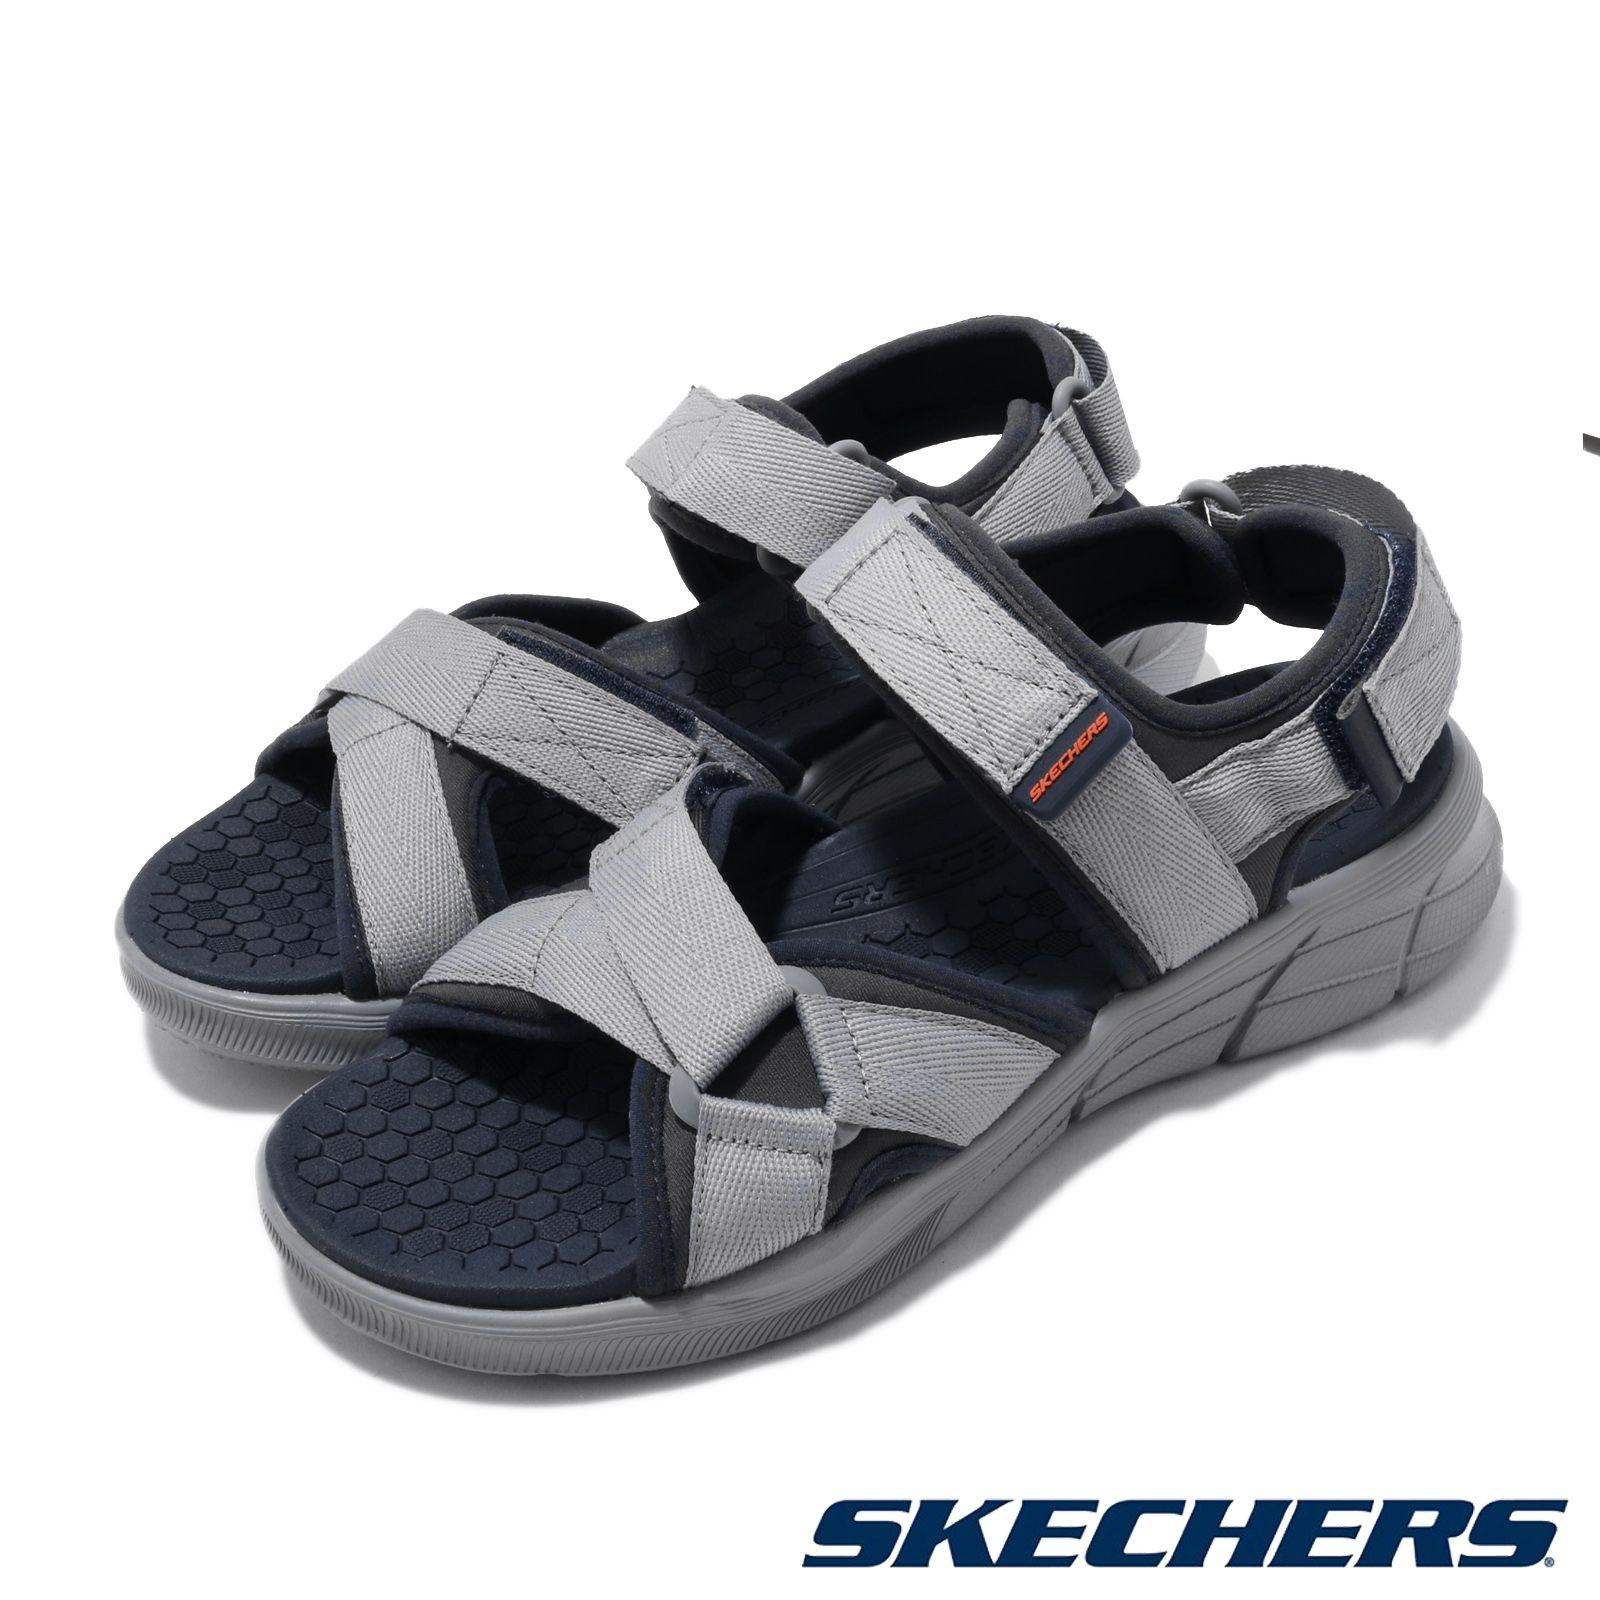 Skechers 涼拖鞋 Equalizer 4 Sandal 男鞋 運動休閒 踏青 魔鬼氈 可調 夏日必 灰 藍 237050NVCC 237050NVCC